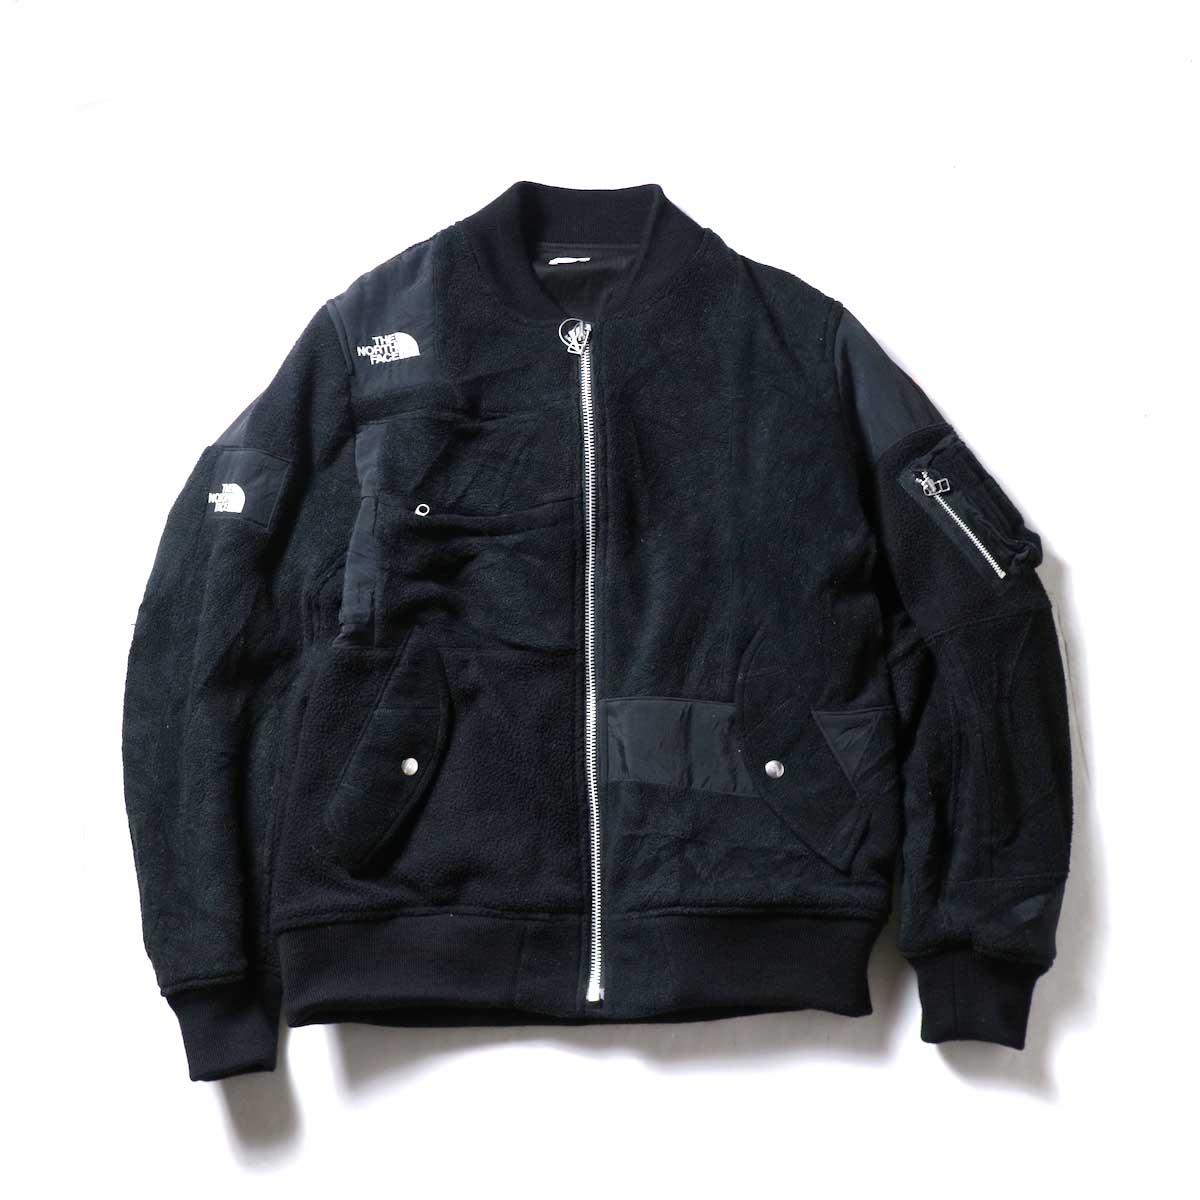 OLD PARK / Flight Jacket Outdoor (Black , XLsize)